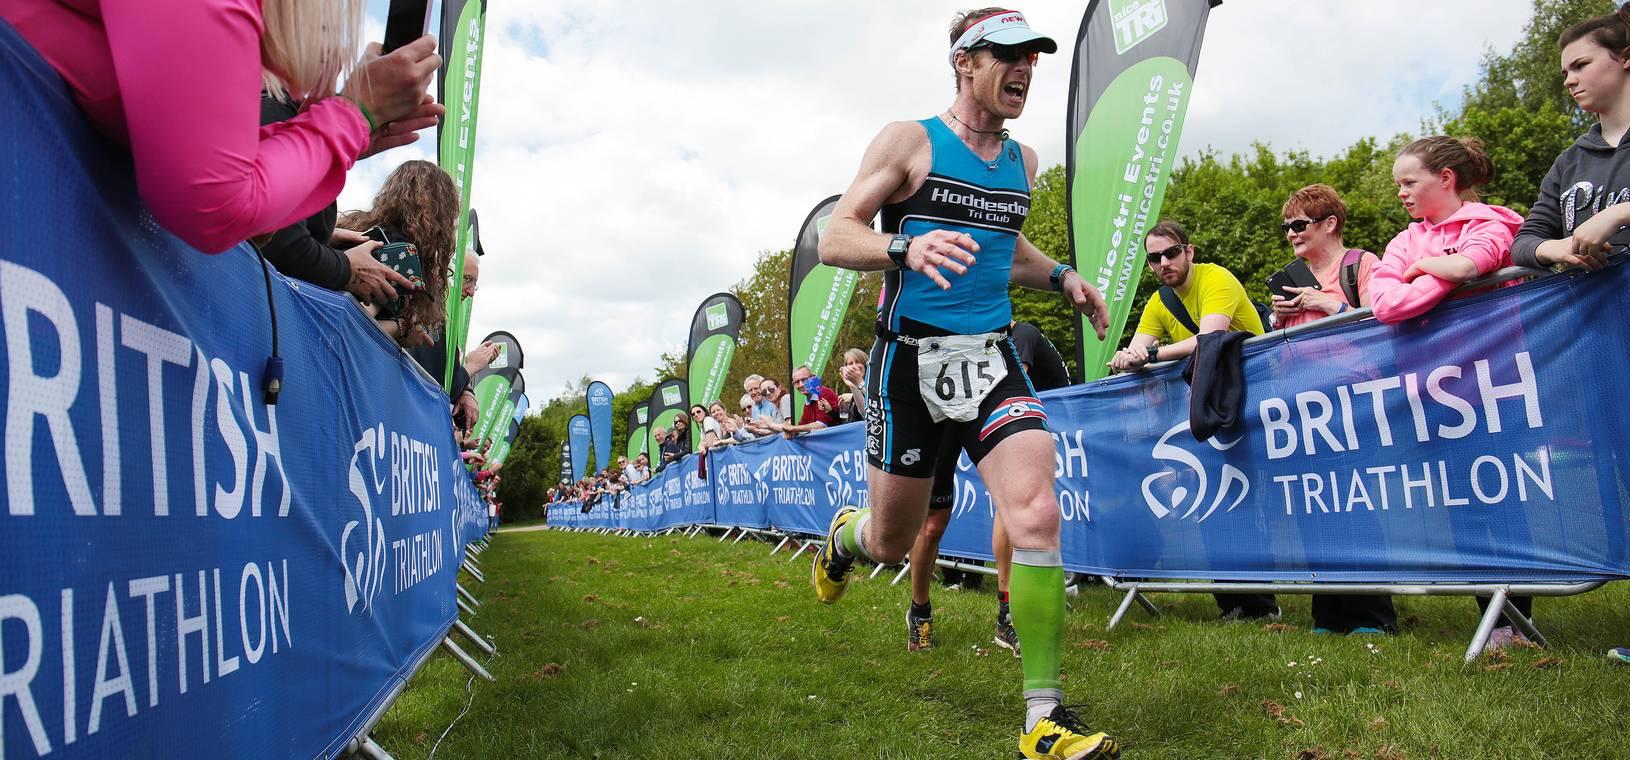 4c51a5069bb British Triathlon confirms 2018 Age-Group Major Events Calendar ...